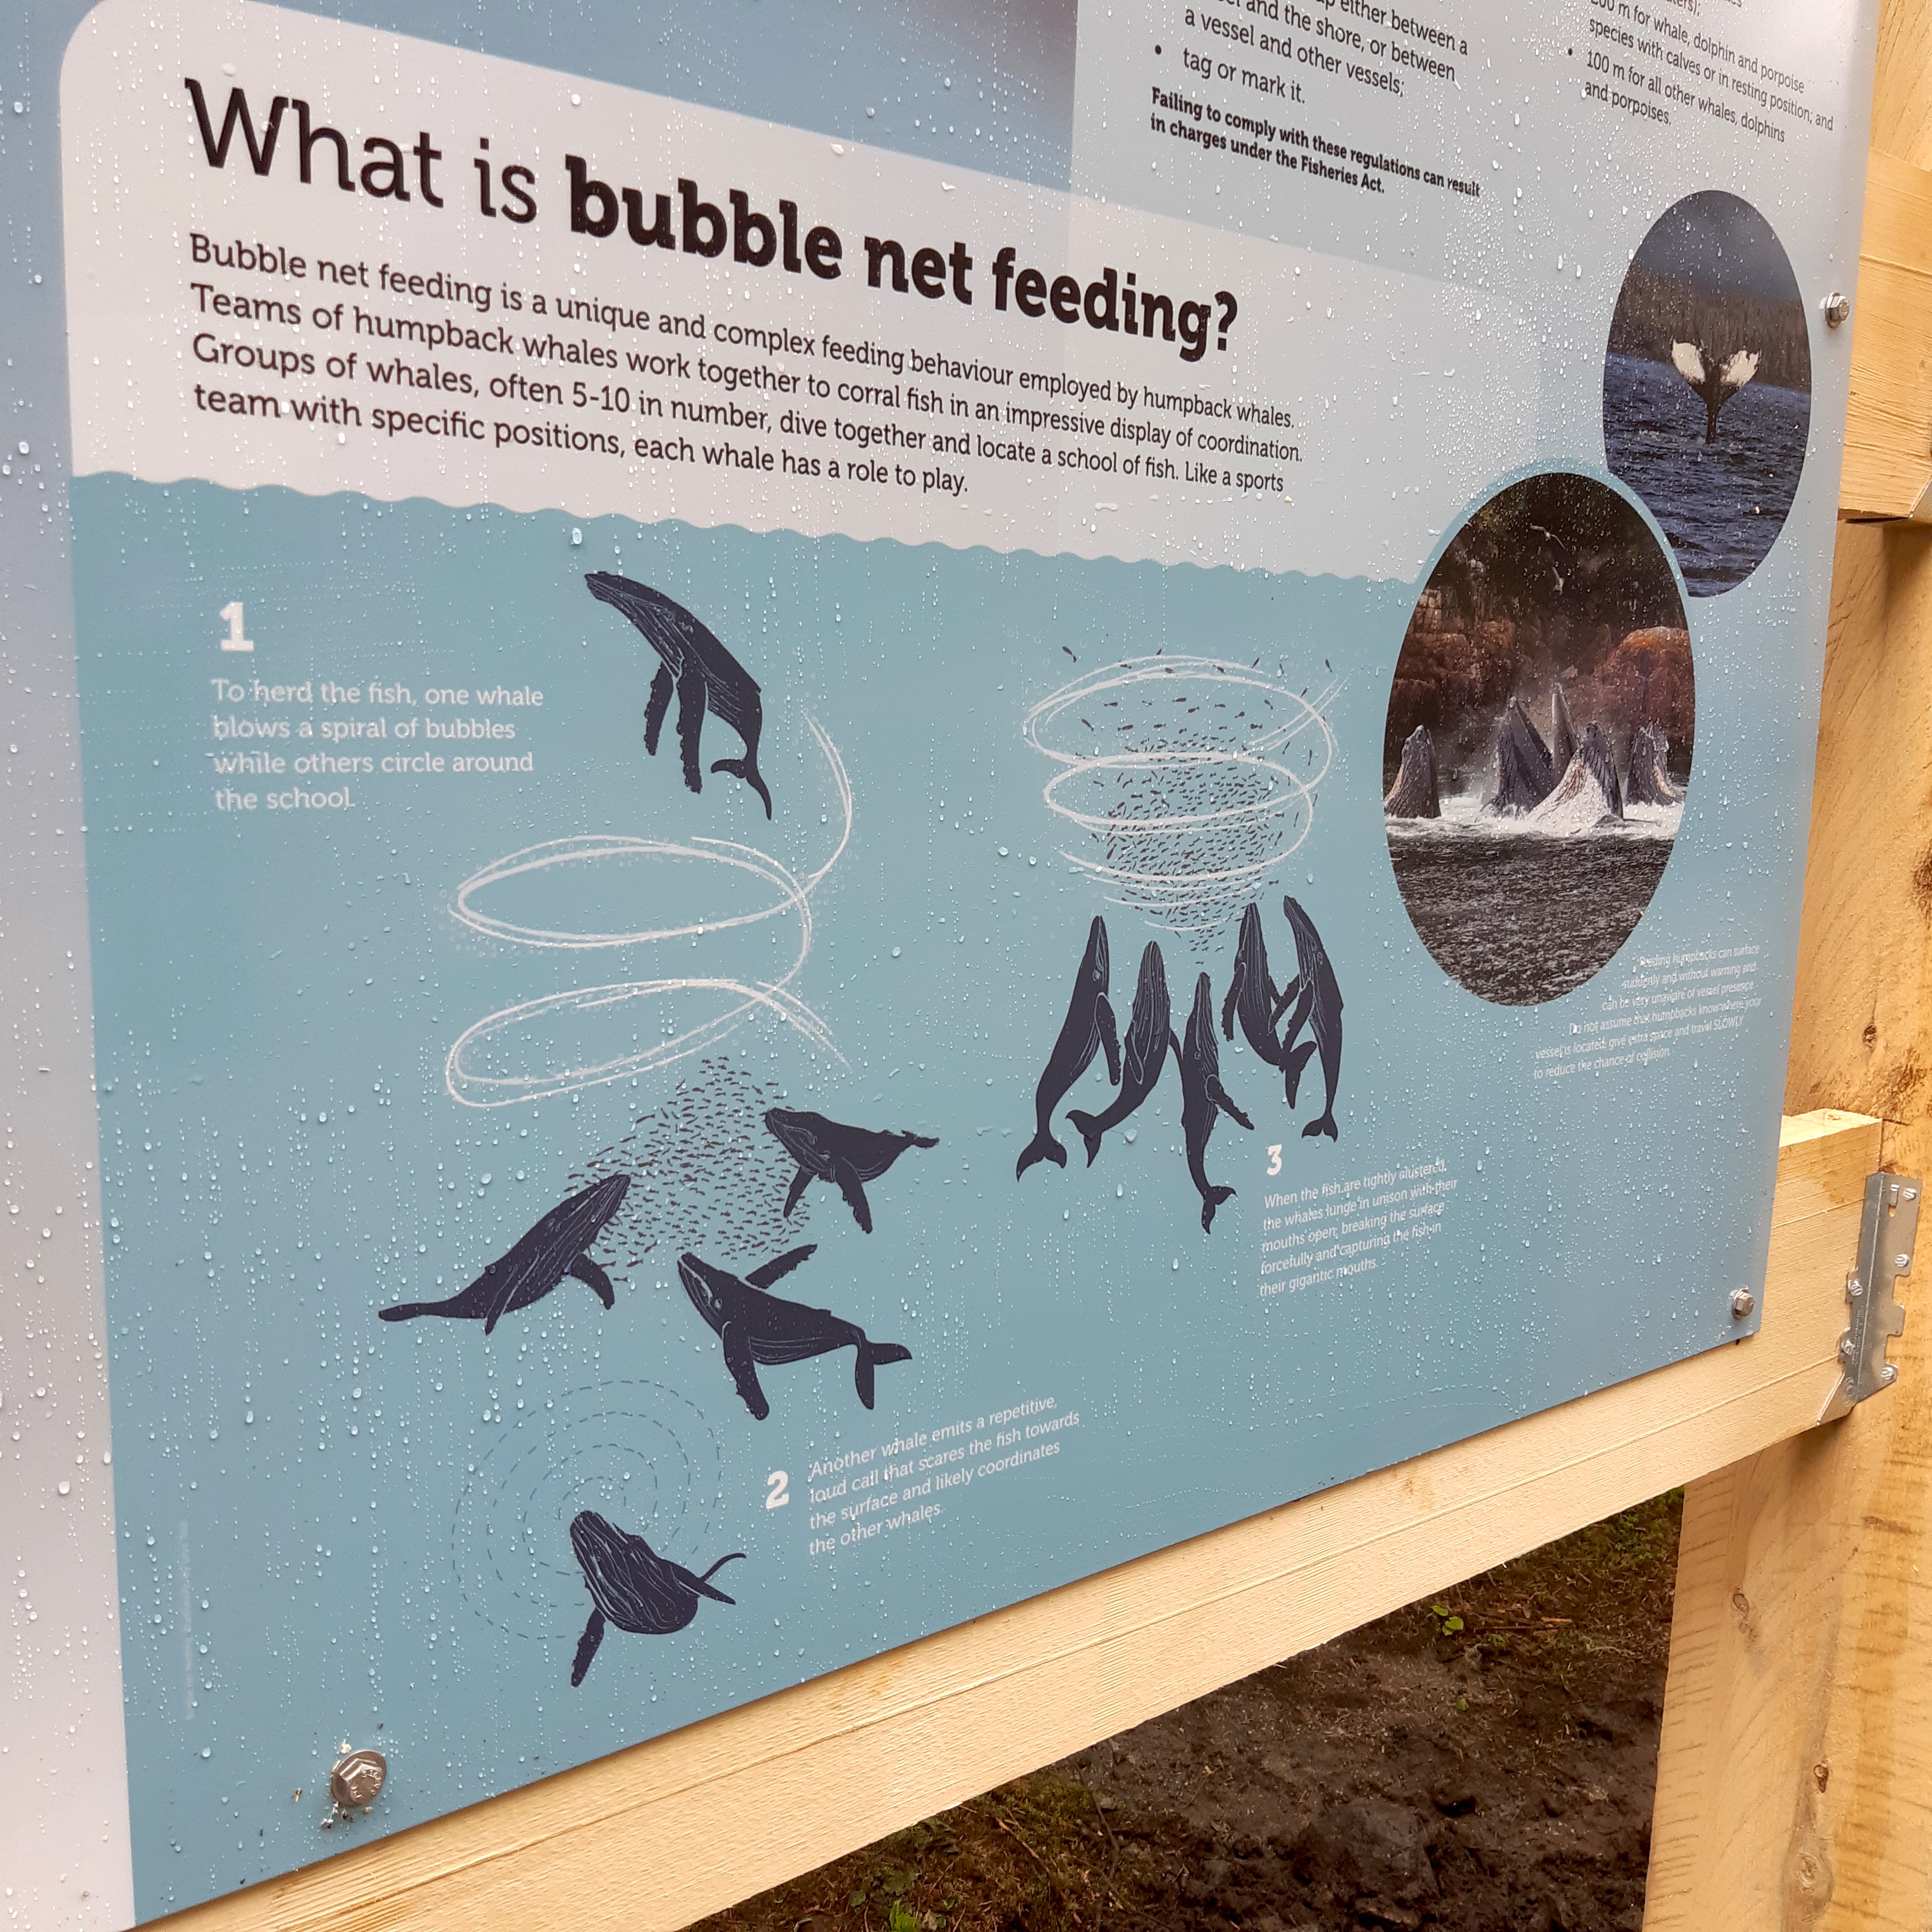 Humpback Bubblenet Feeding Diagram